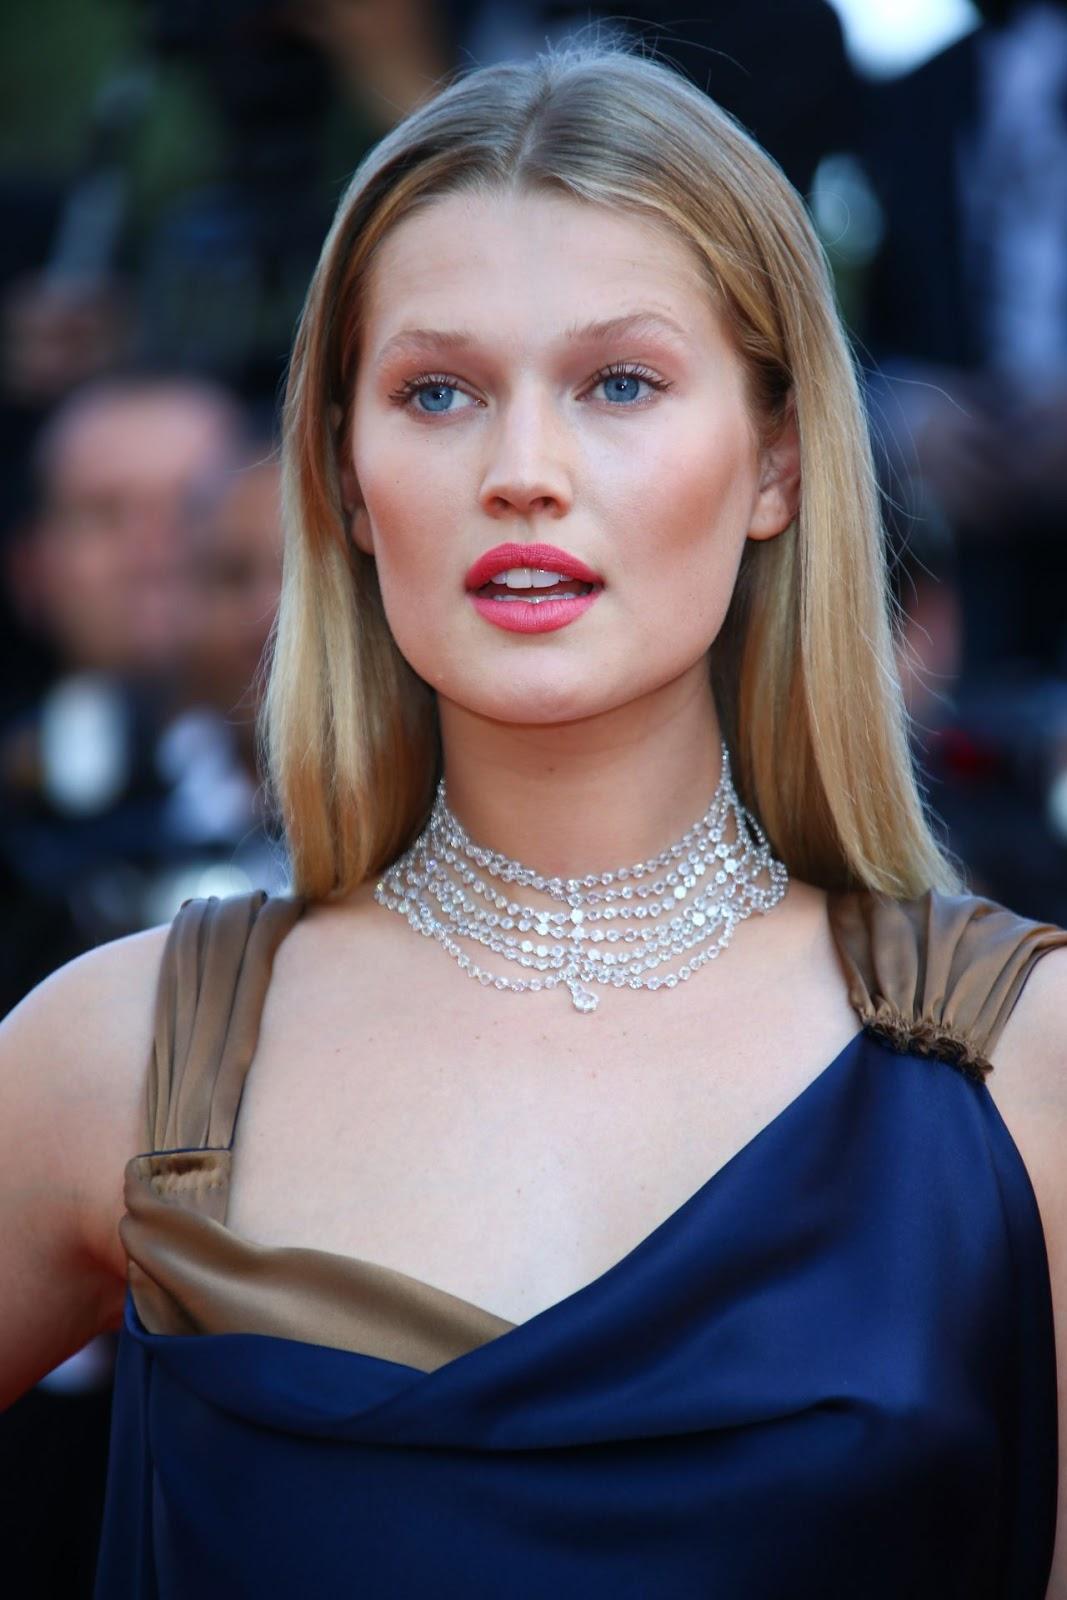 Full HQ Photos of Toni Garrn in blue dress at Carol Premiere 2015 Cannes Film Festival